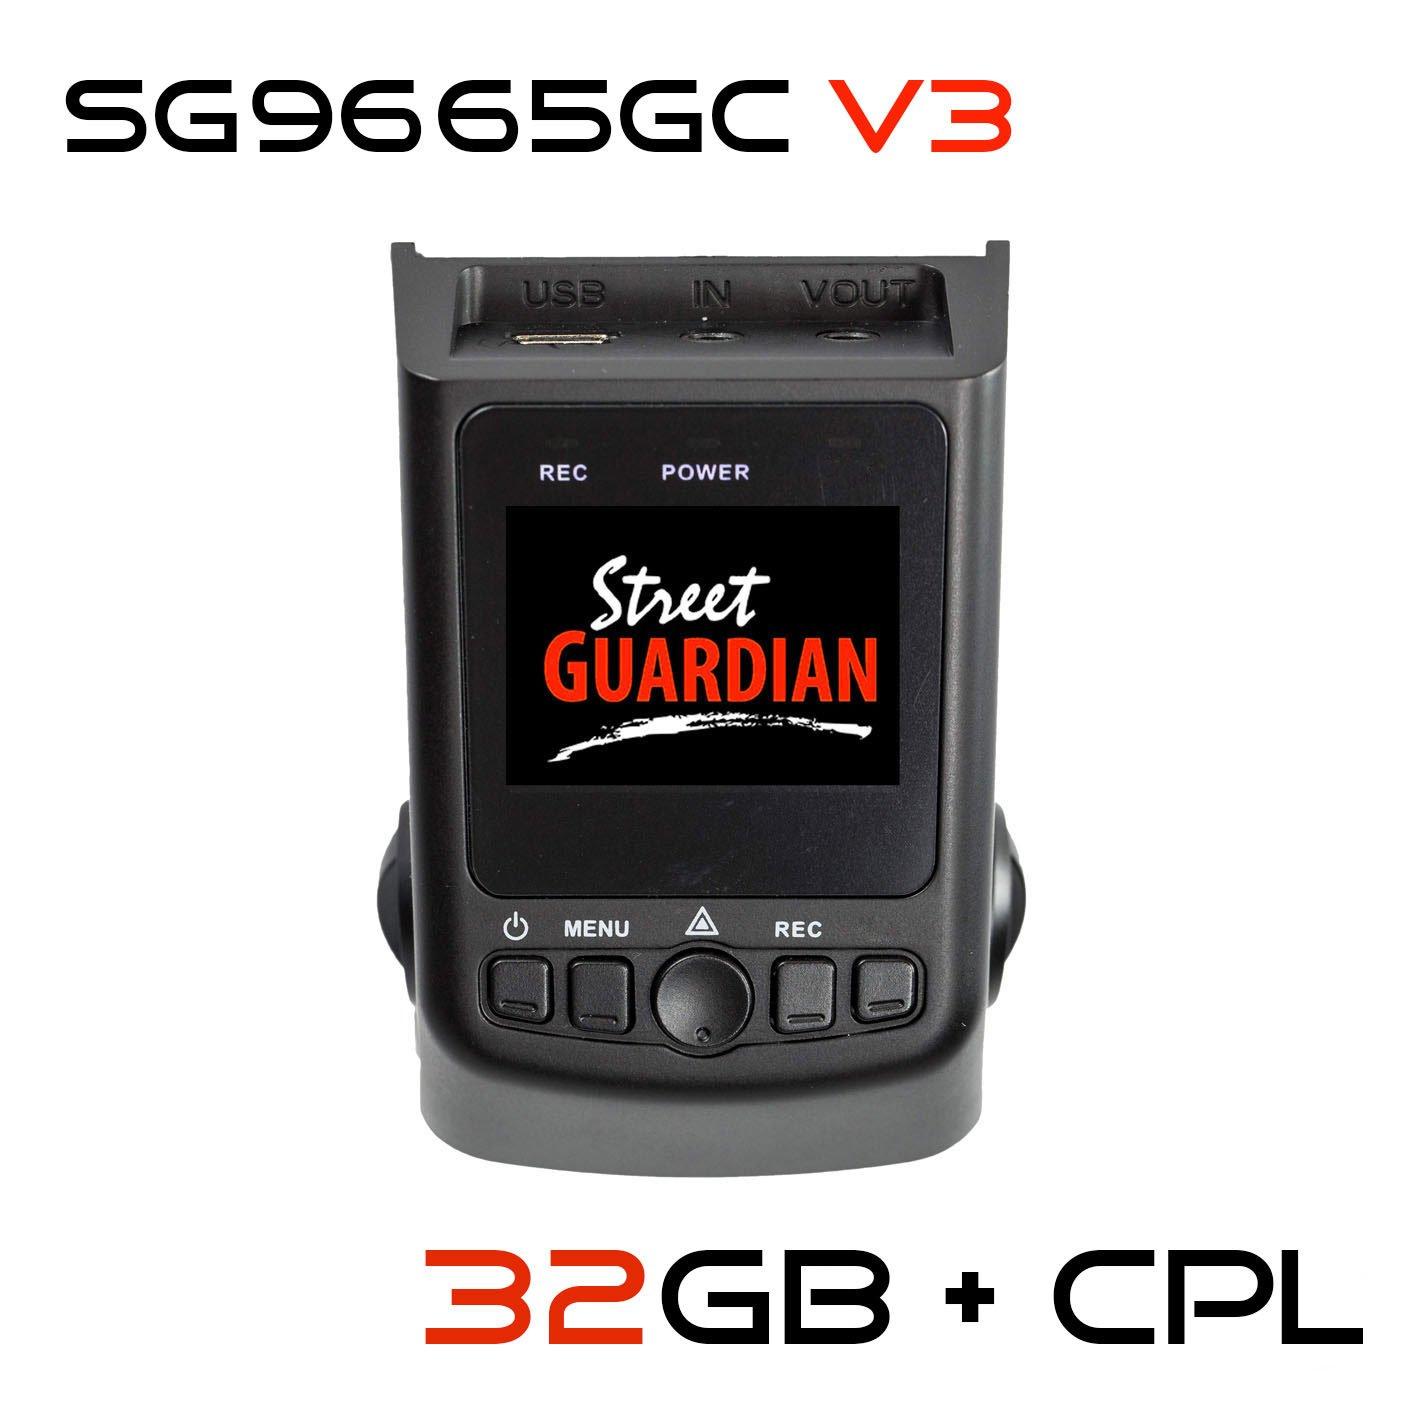 Street Guardian SG9665GC v3 2017 edition + 32GB microSD Card + CPL + USB/OTG Android Card Reader + GPS, Supercapacitor Sony Exmor IMX322 WDR CMOS Sensor DashCam 1080P 30FPS (Best Of - DashCamTalk)